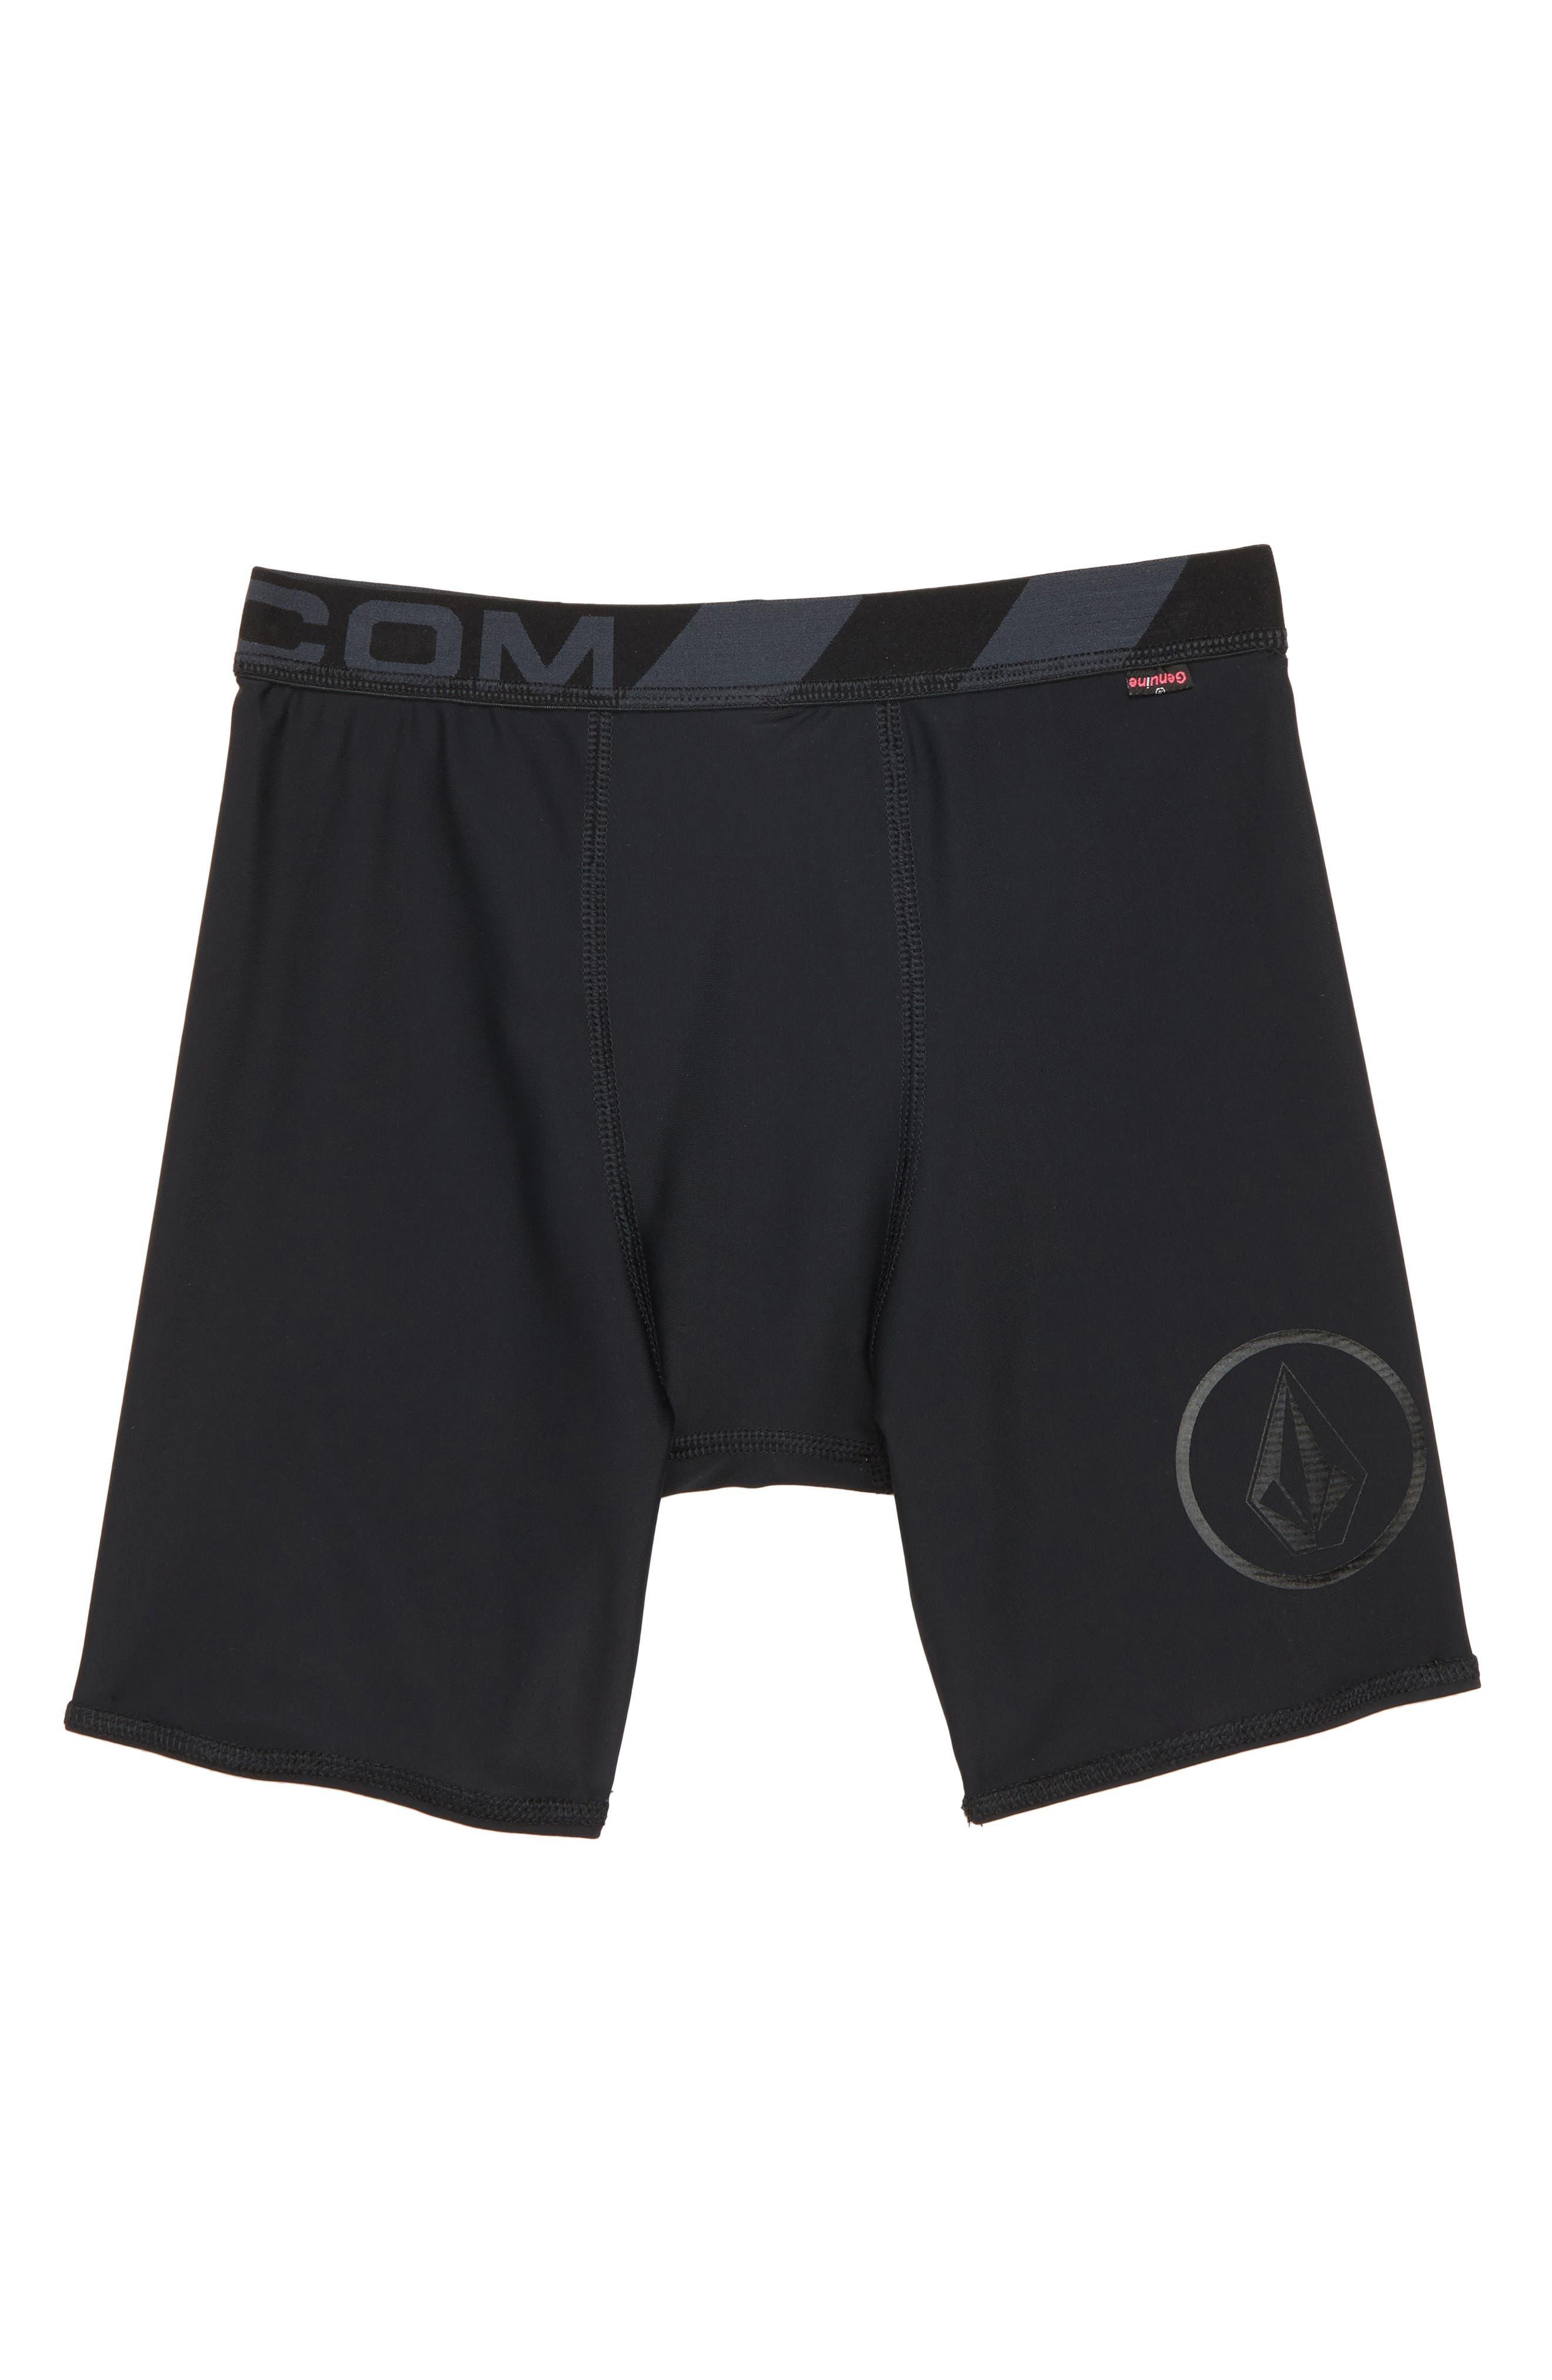 Volcom JJ Chones Compression Shorts (Big Boys)